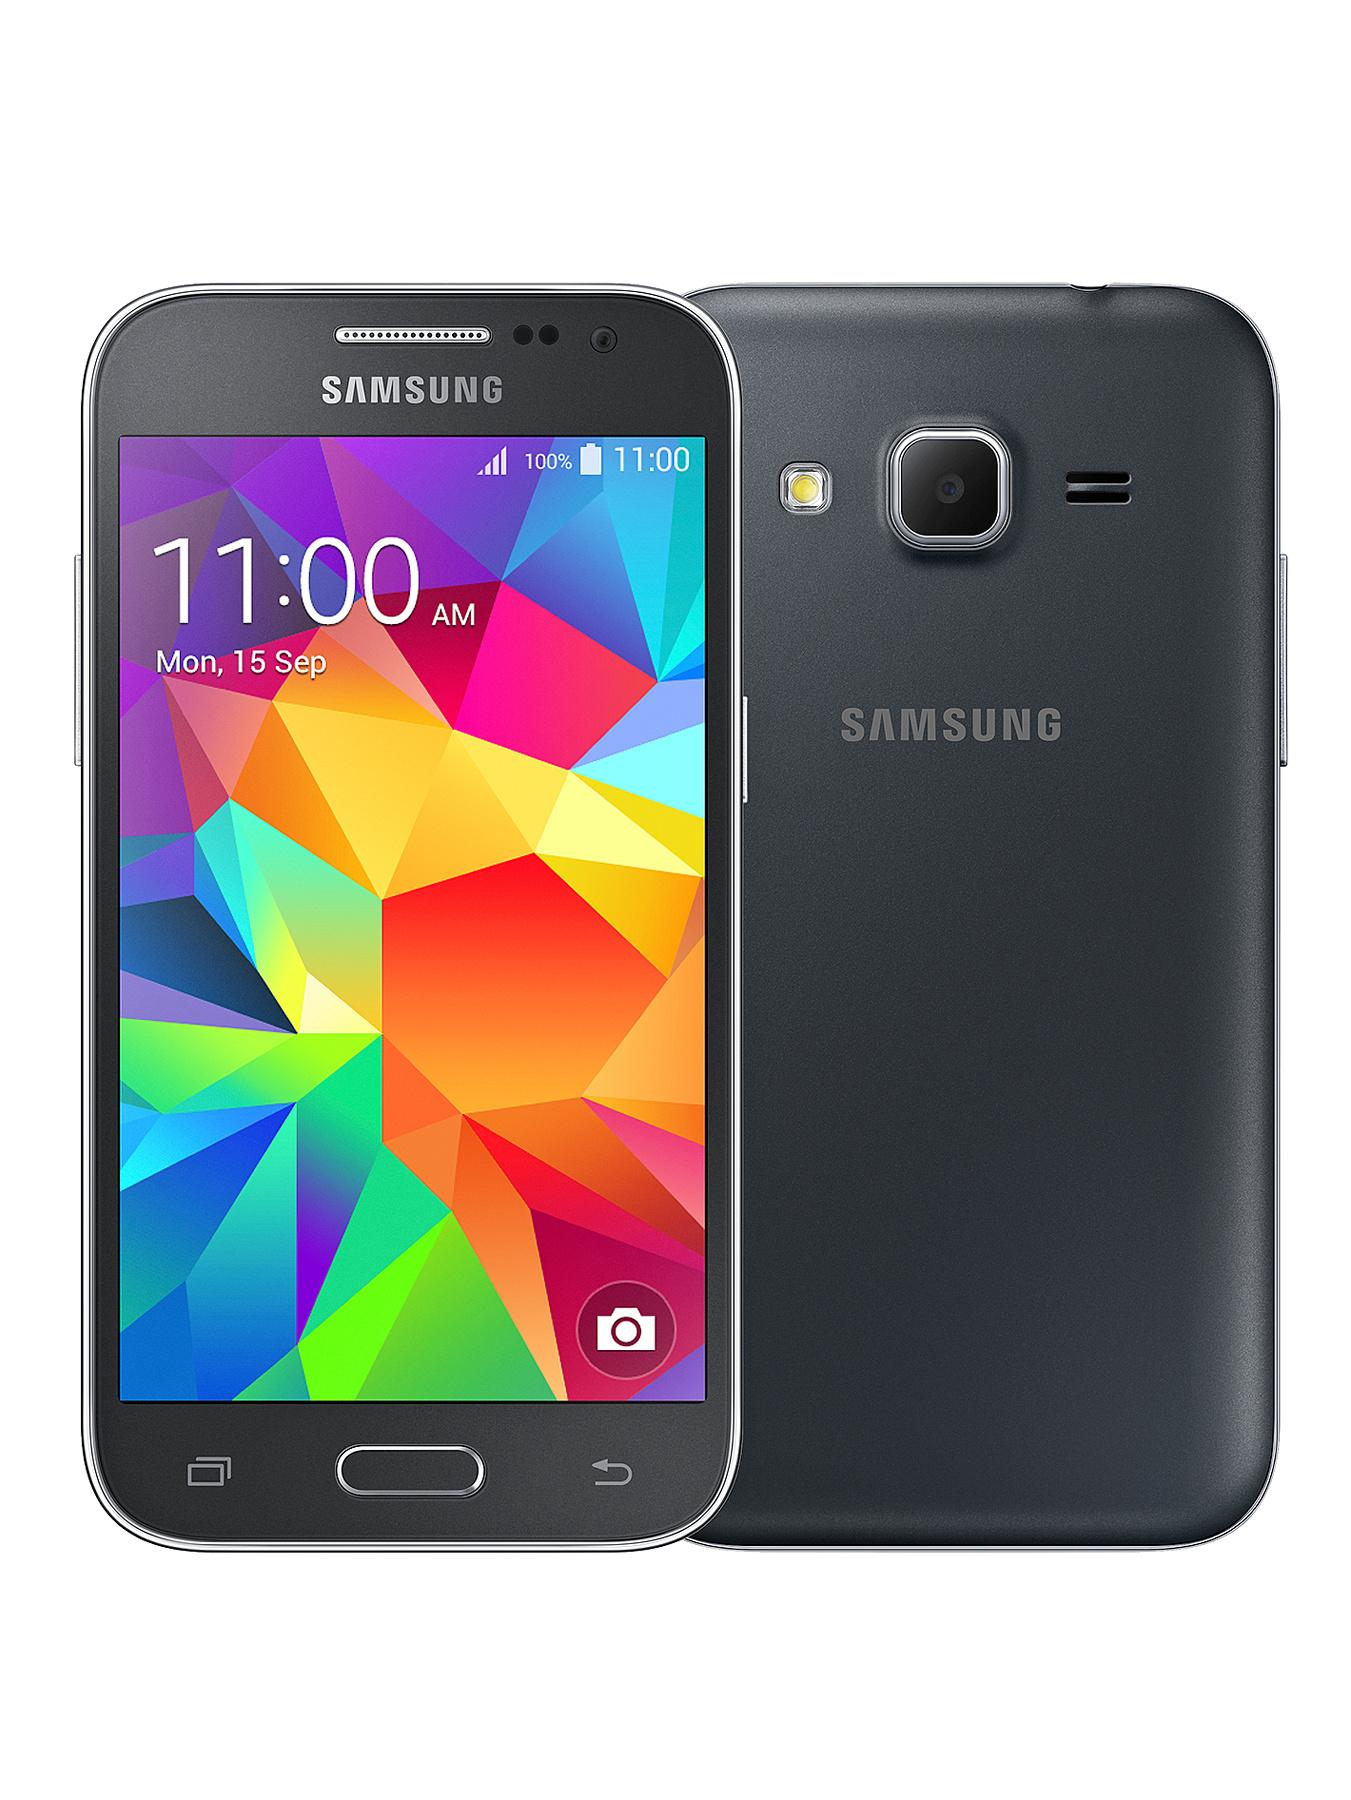 Samsung Core Prime Smartphone - Sim FREE Handset - Black